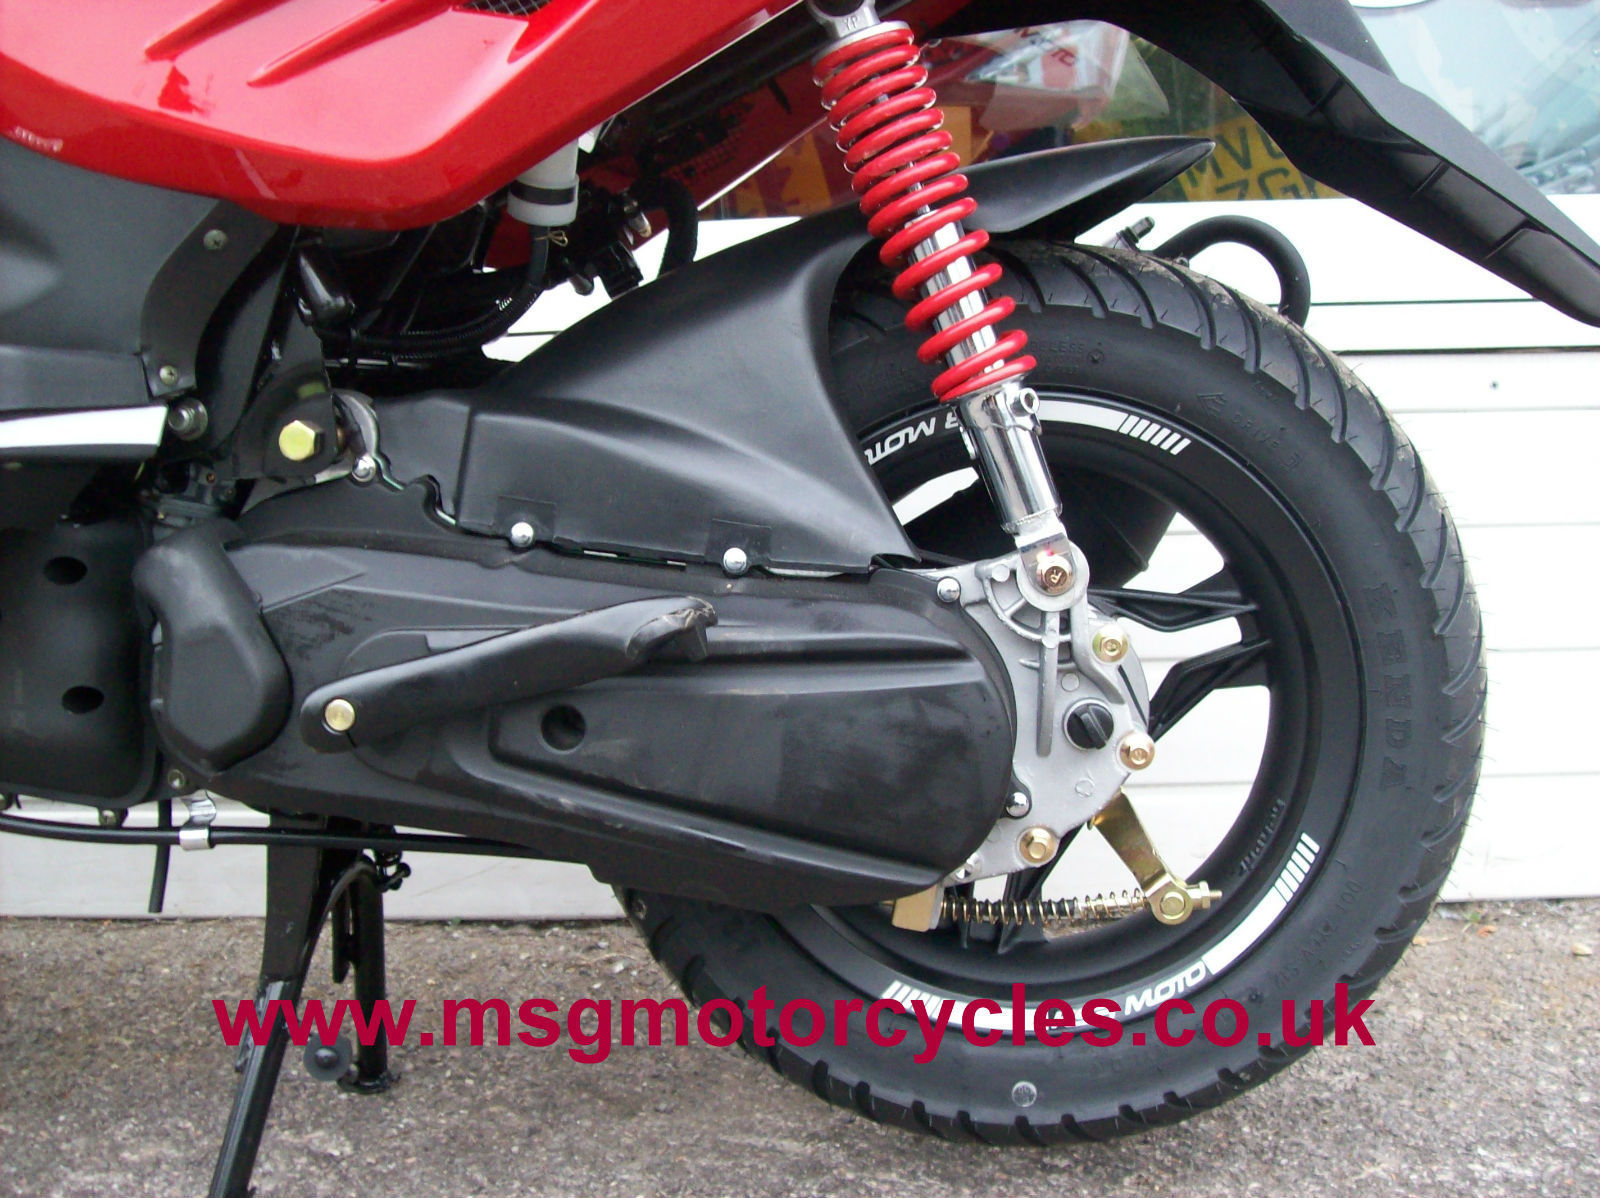 generic ksr moto sirion 50cc excellent sports 50cc moped. Black Bedroom Furniture Sets. Home Design Ideas